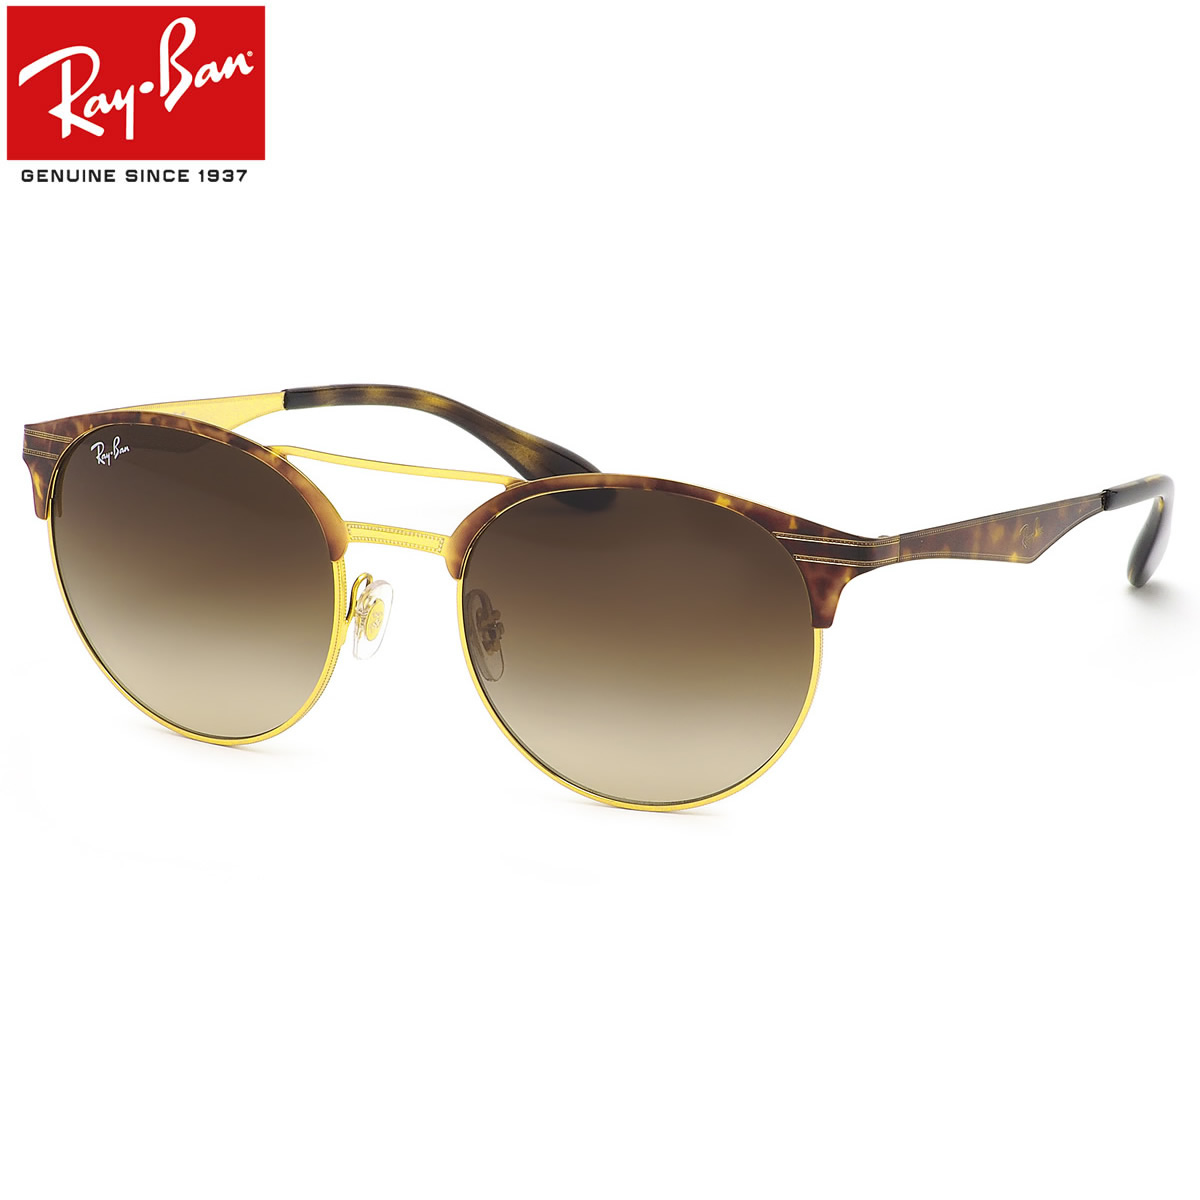 0a5b86934b9 Optical Shop Thats  Ray-Ban Sunglasses RB3545 900813 multiple sizes ...